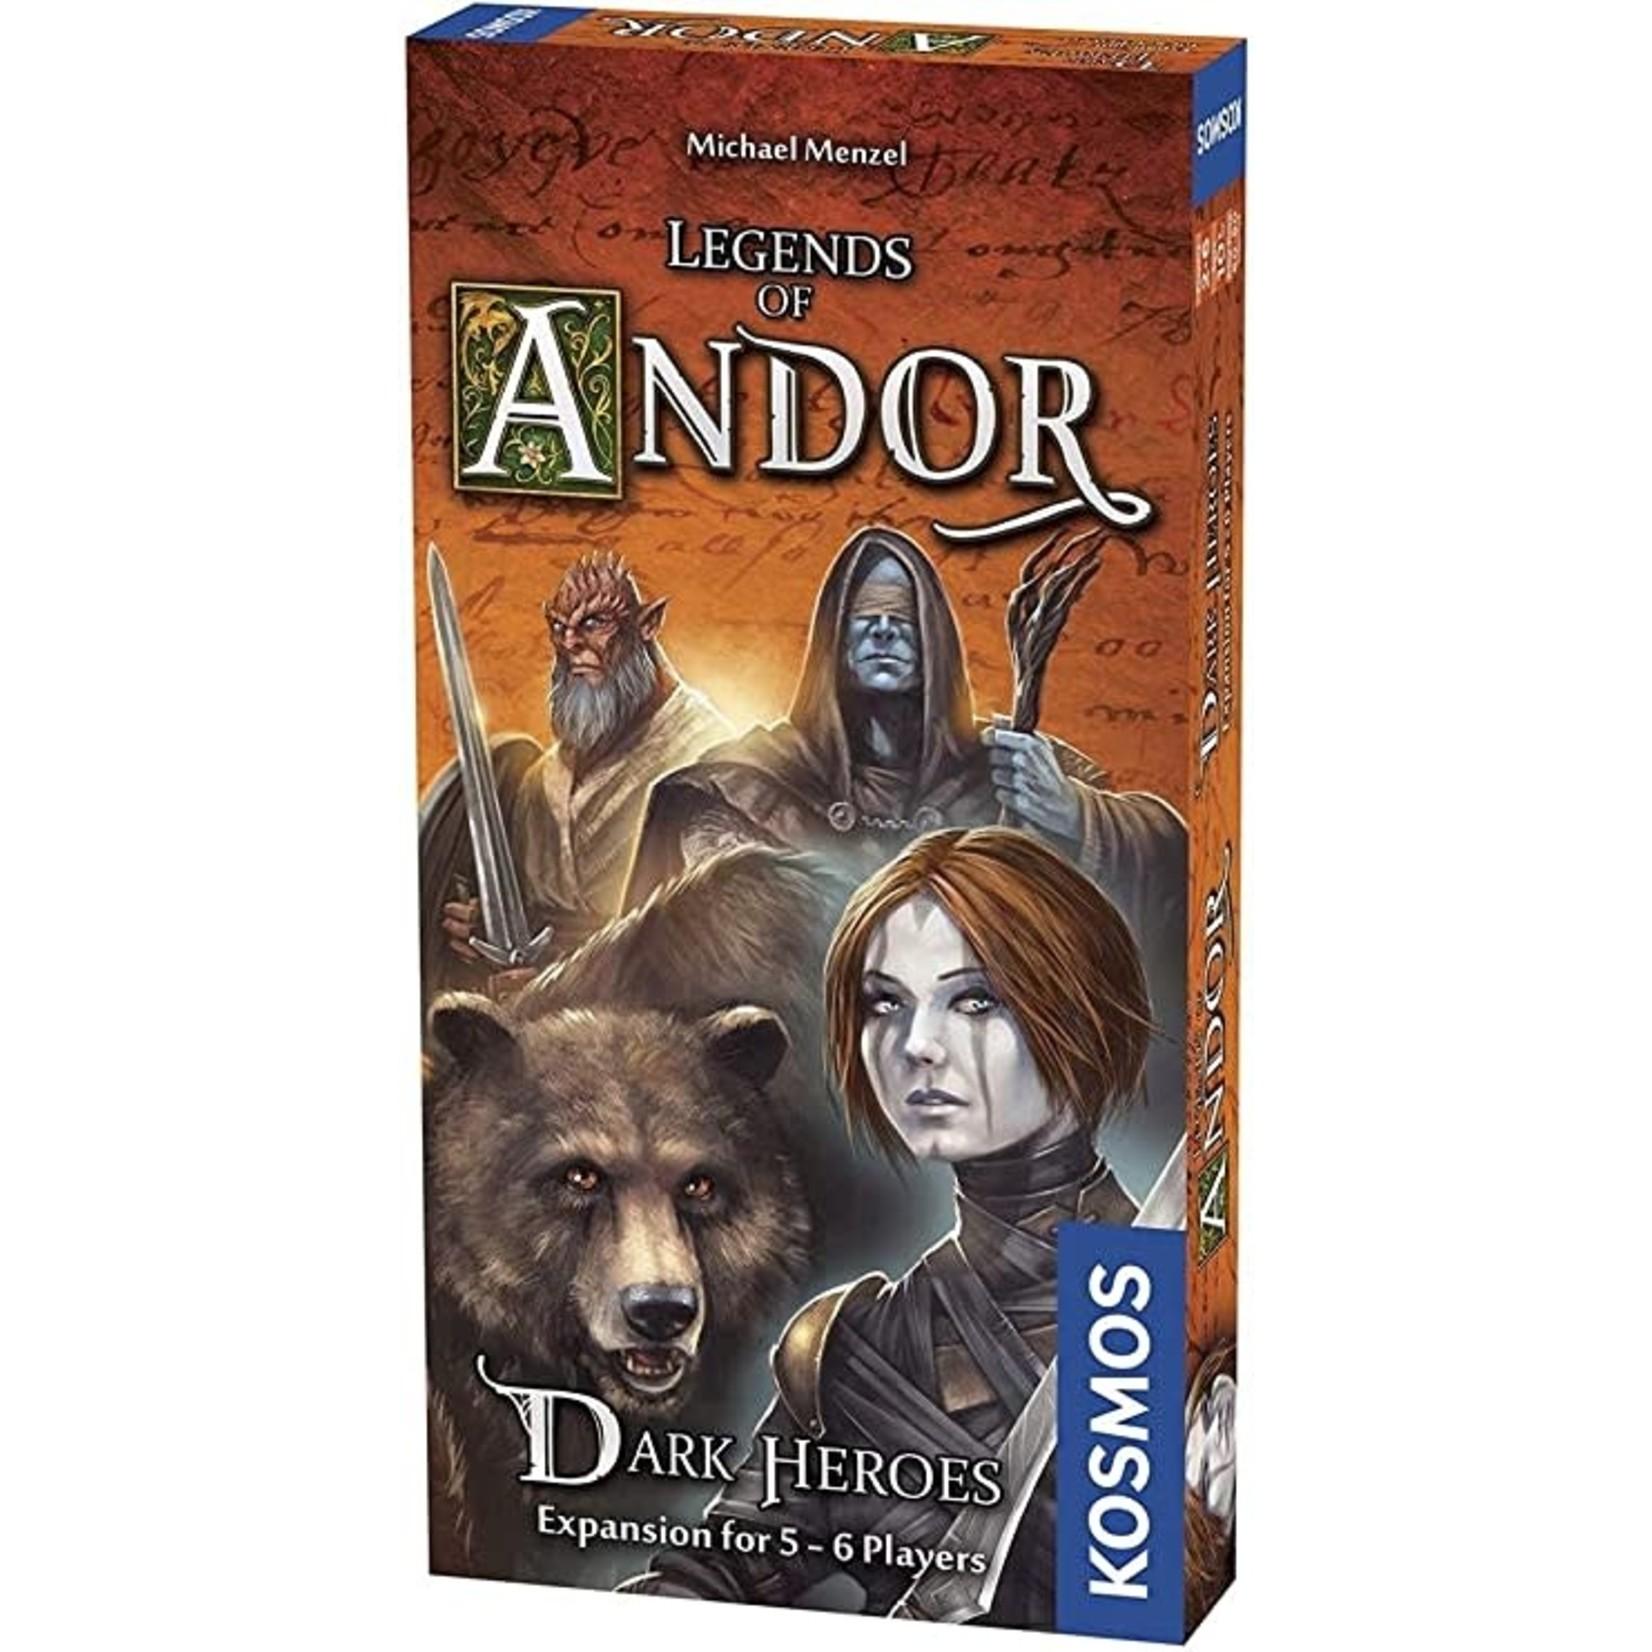 Legend of Andor: Dark Heroes Expansion